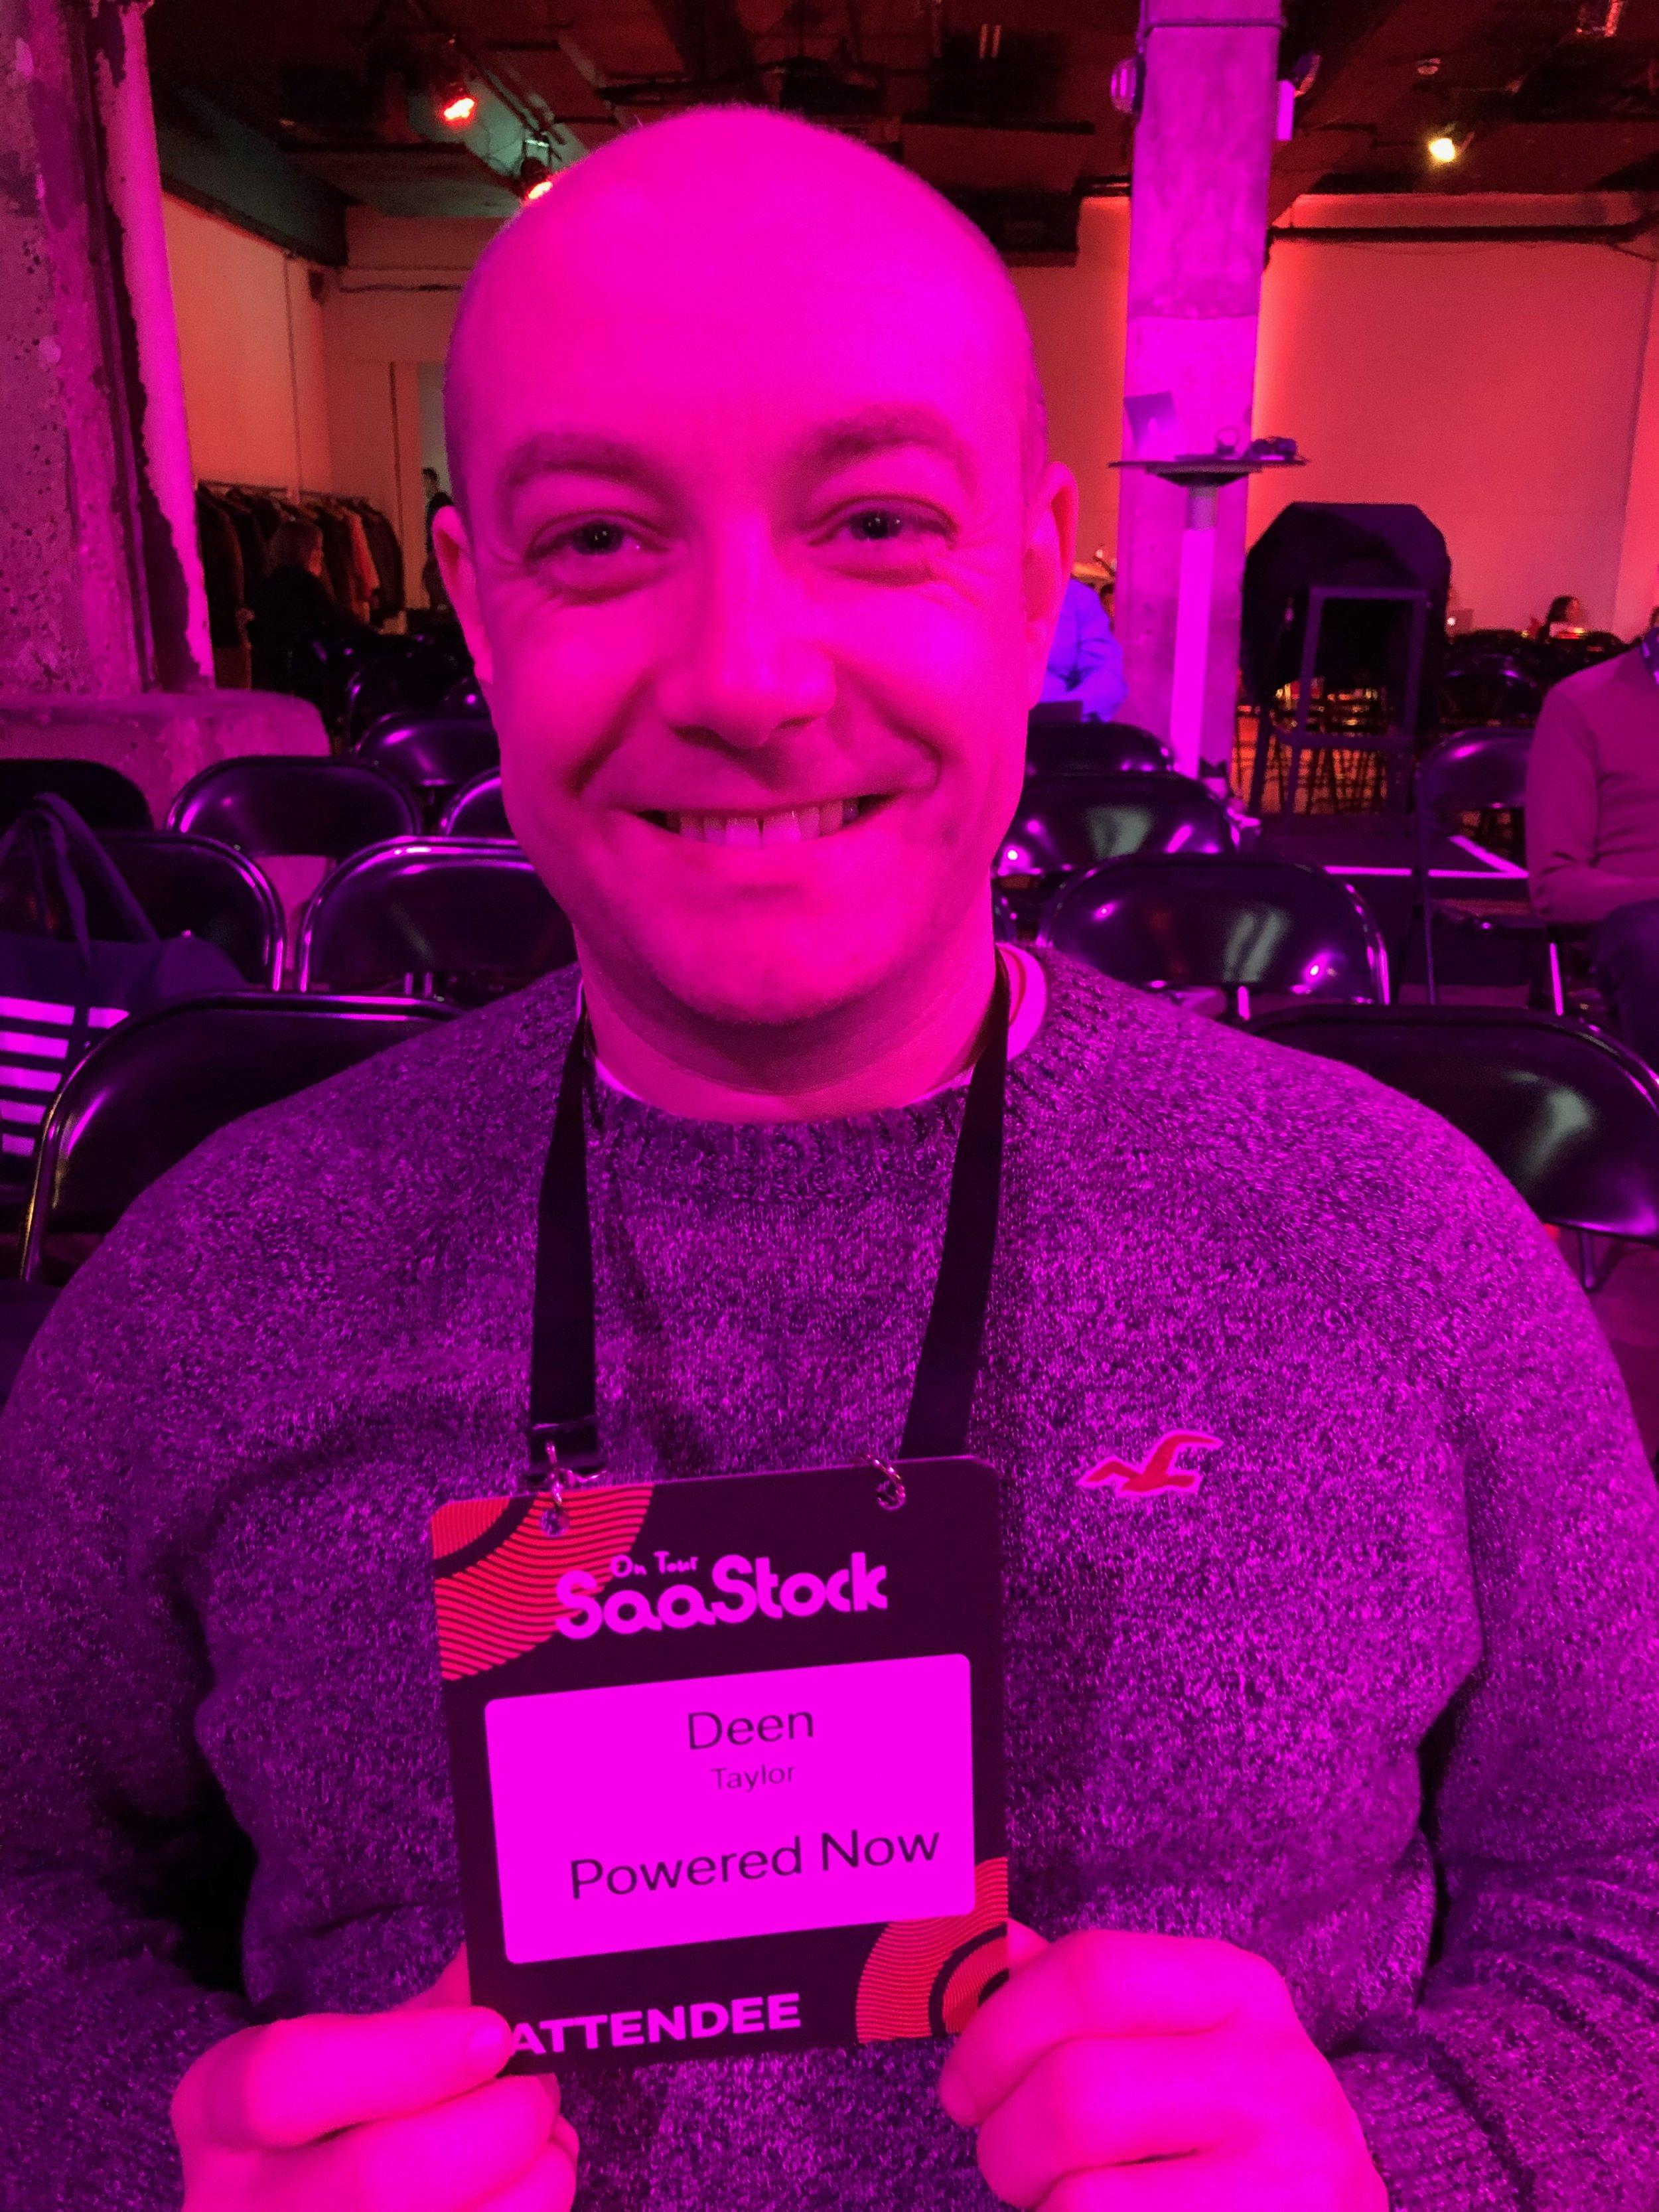 Dwayne at SaaStock London 2018